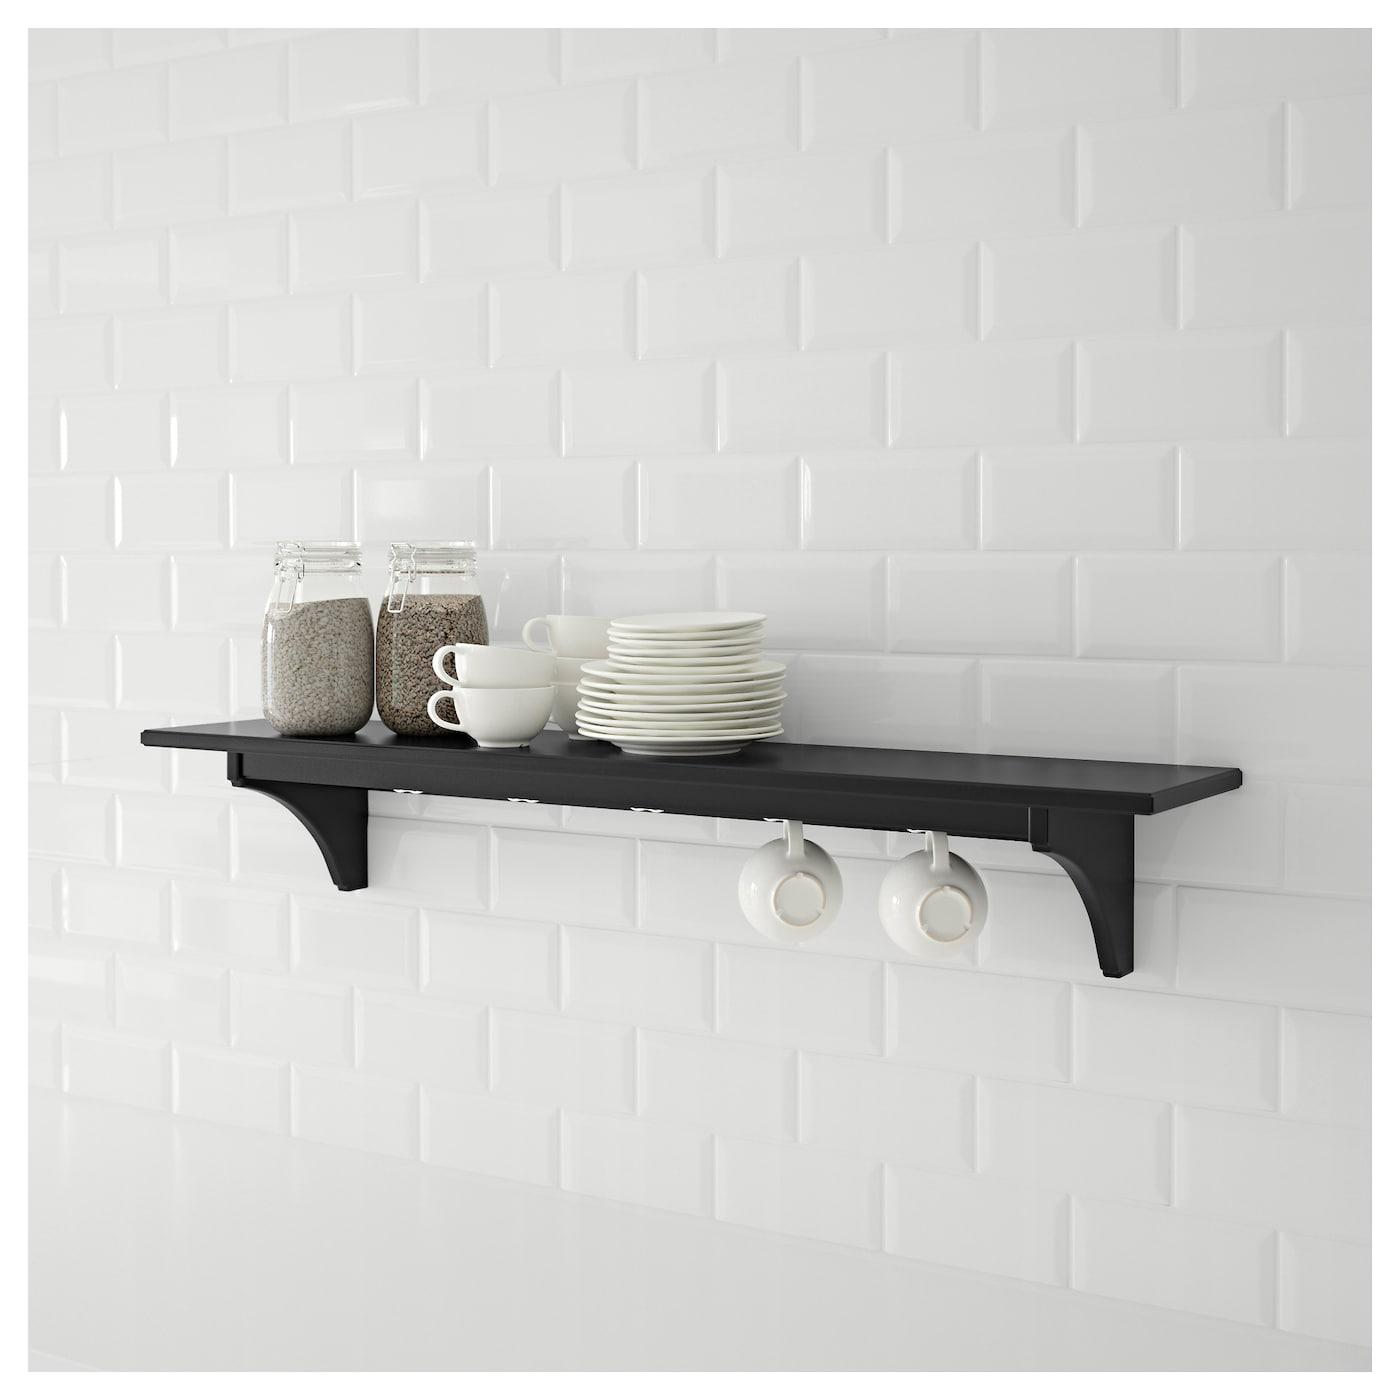 Ikea Kitchen Shelf: STENSTORP Wall Shelf Black-brown 120 Cm